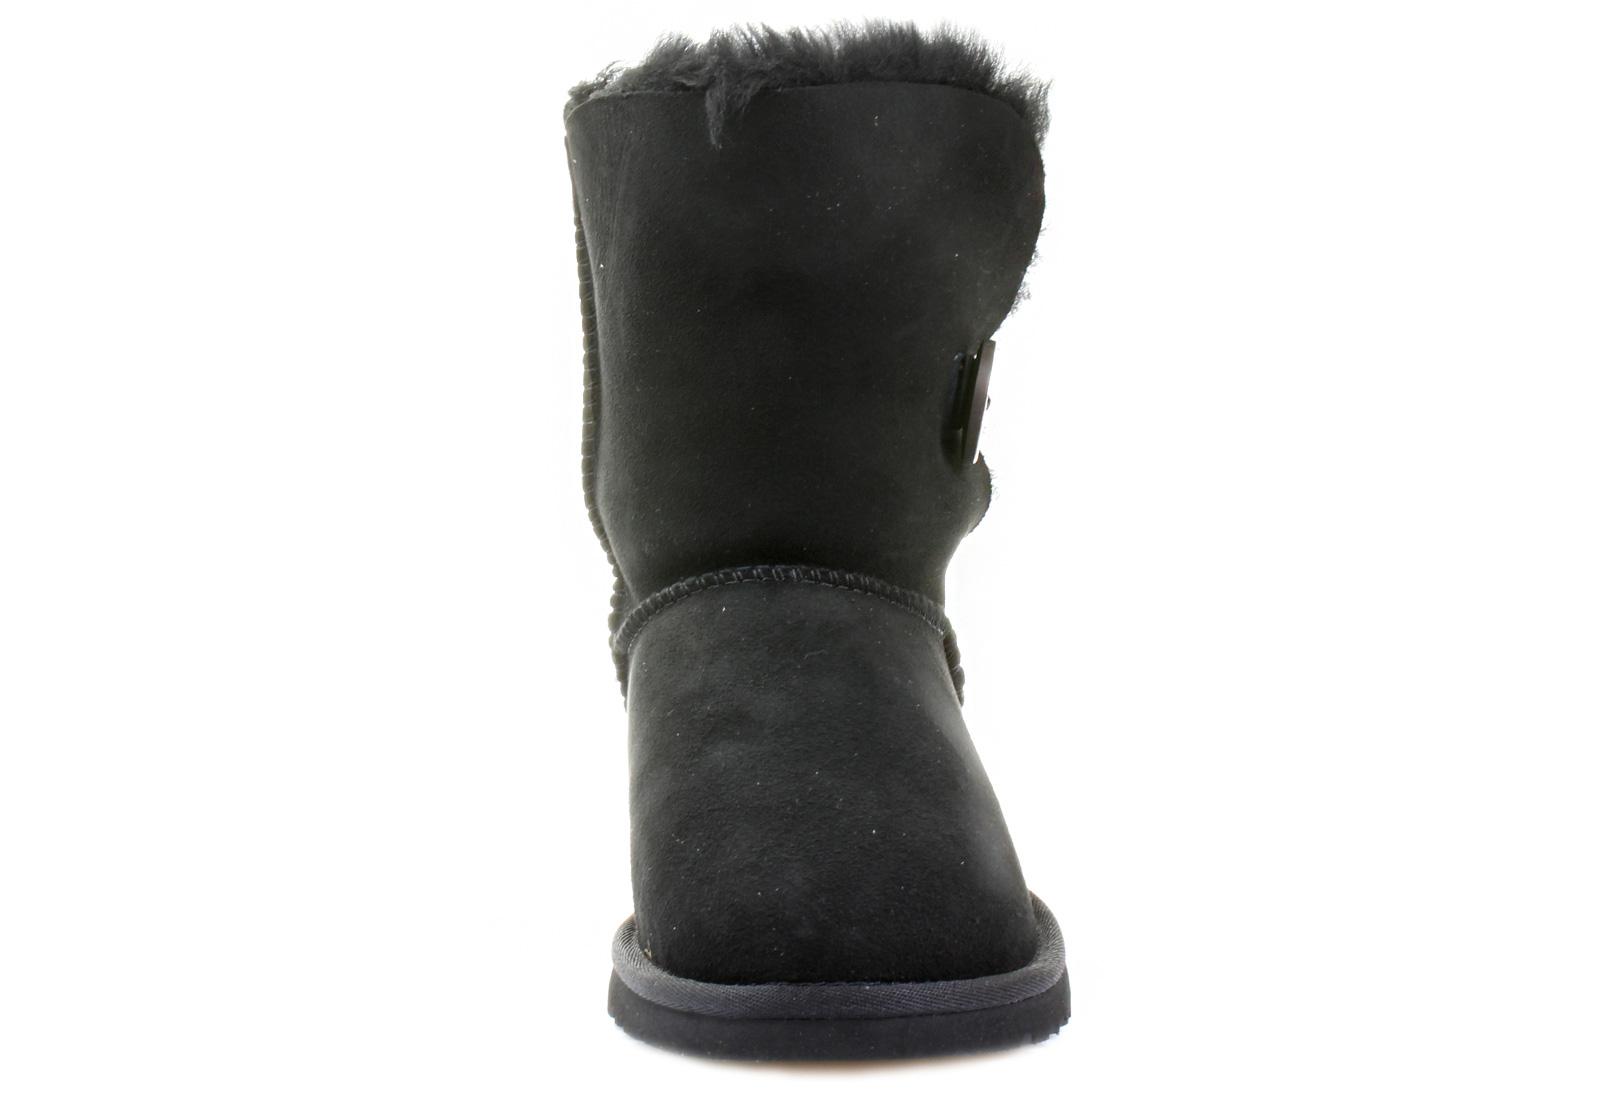 c5bbcf1b0c9 promo code for ugg 5803 boots 50 west e67b5 45f41